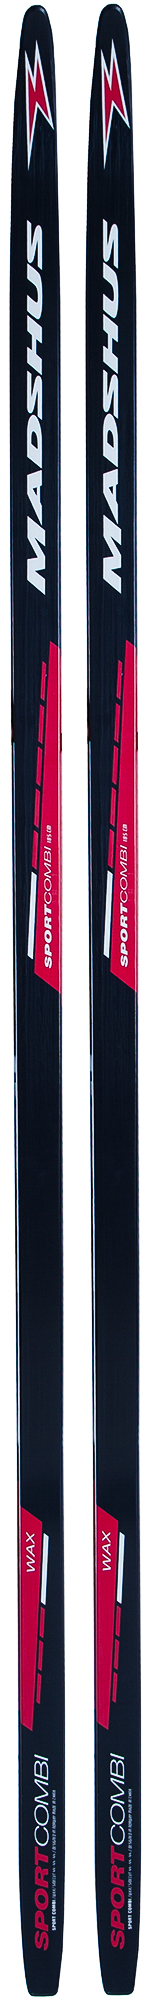 Madshus Беговые лыжи Madshus Sport Combi Wax цена